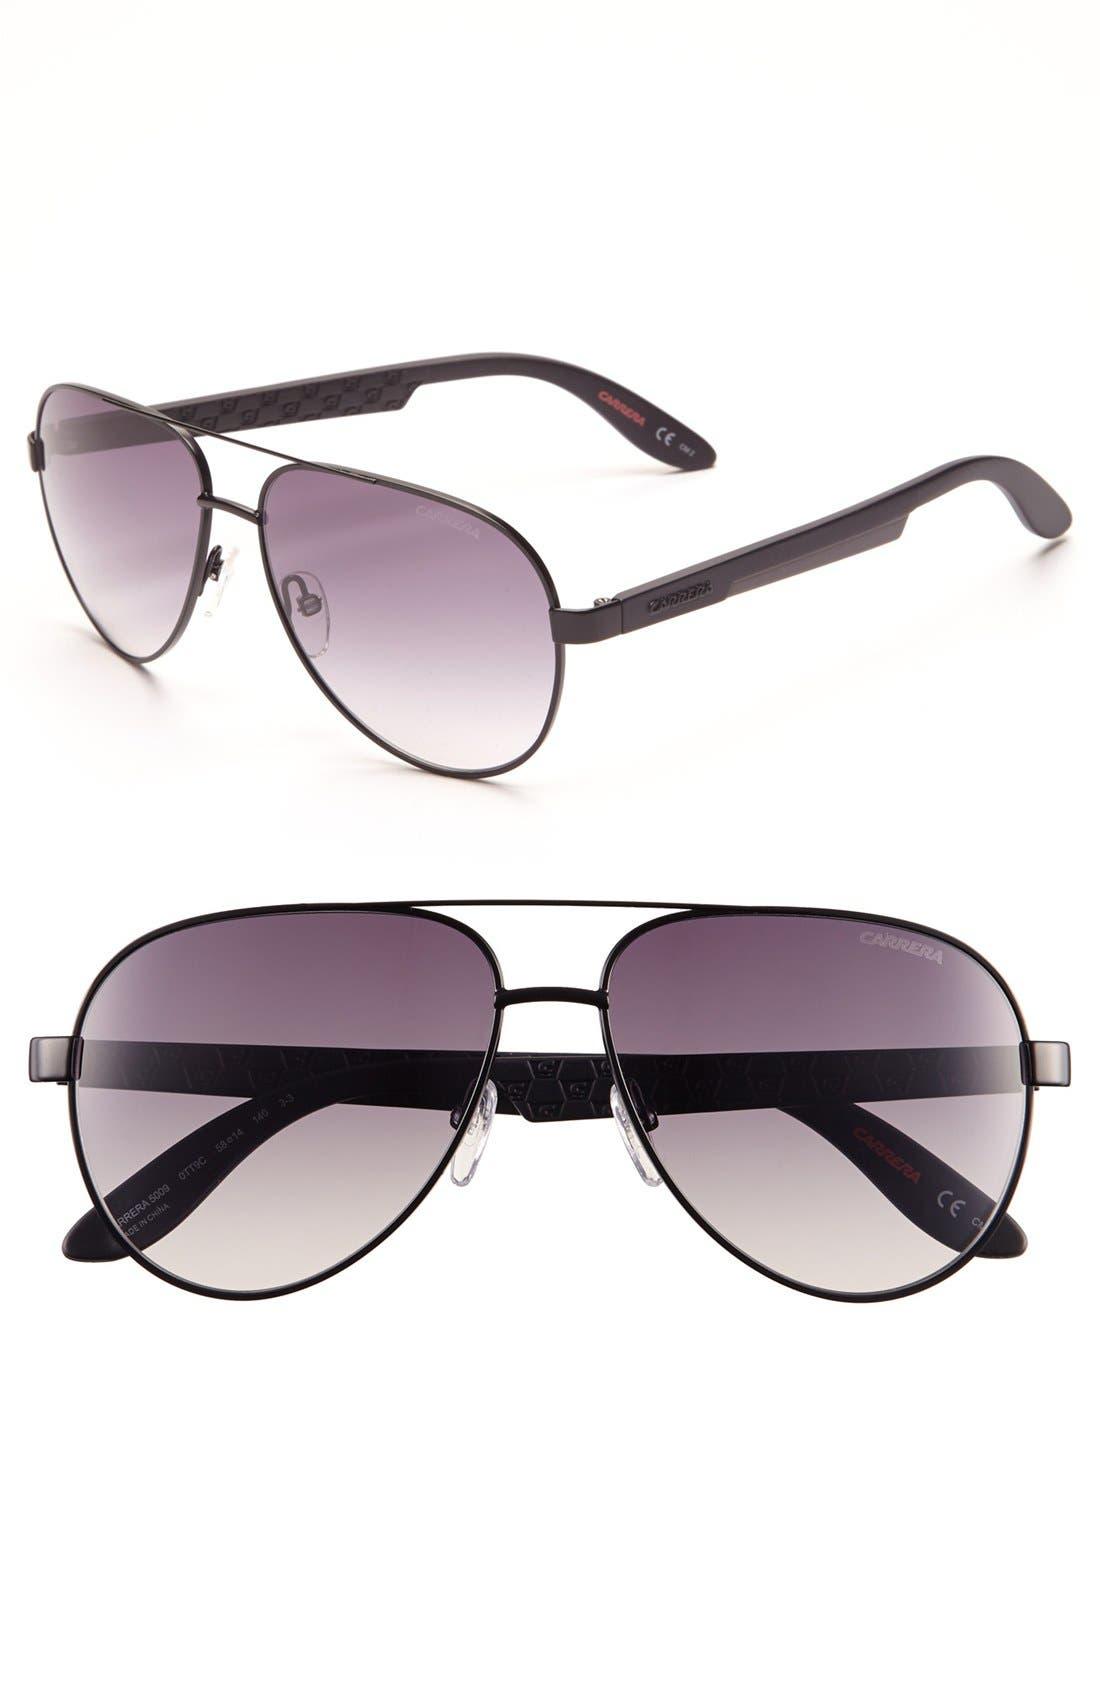 Main Image - Carrera Eyewear 58mm Aviator Sunglasses